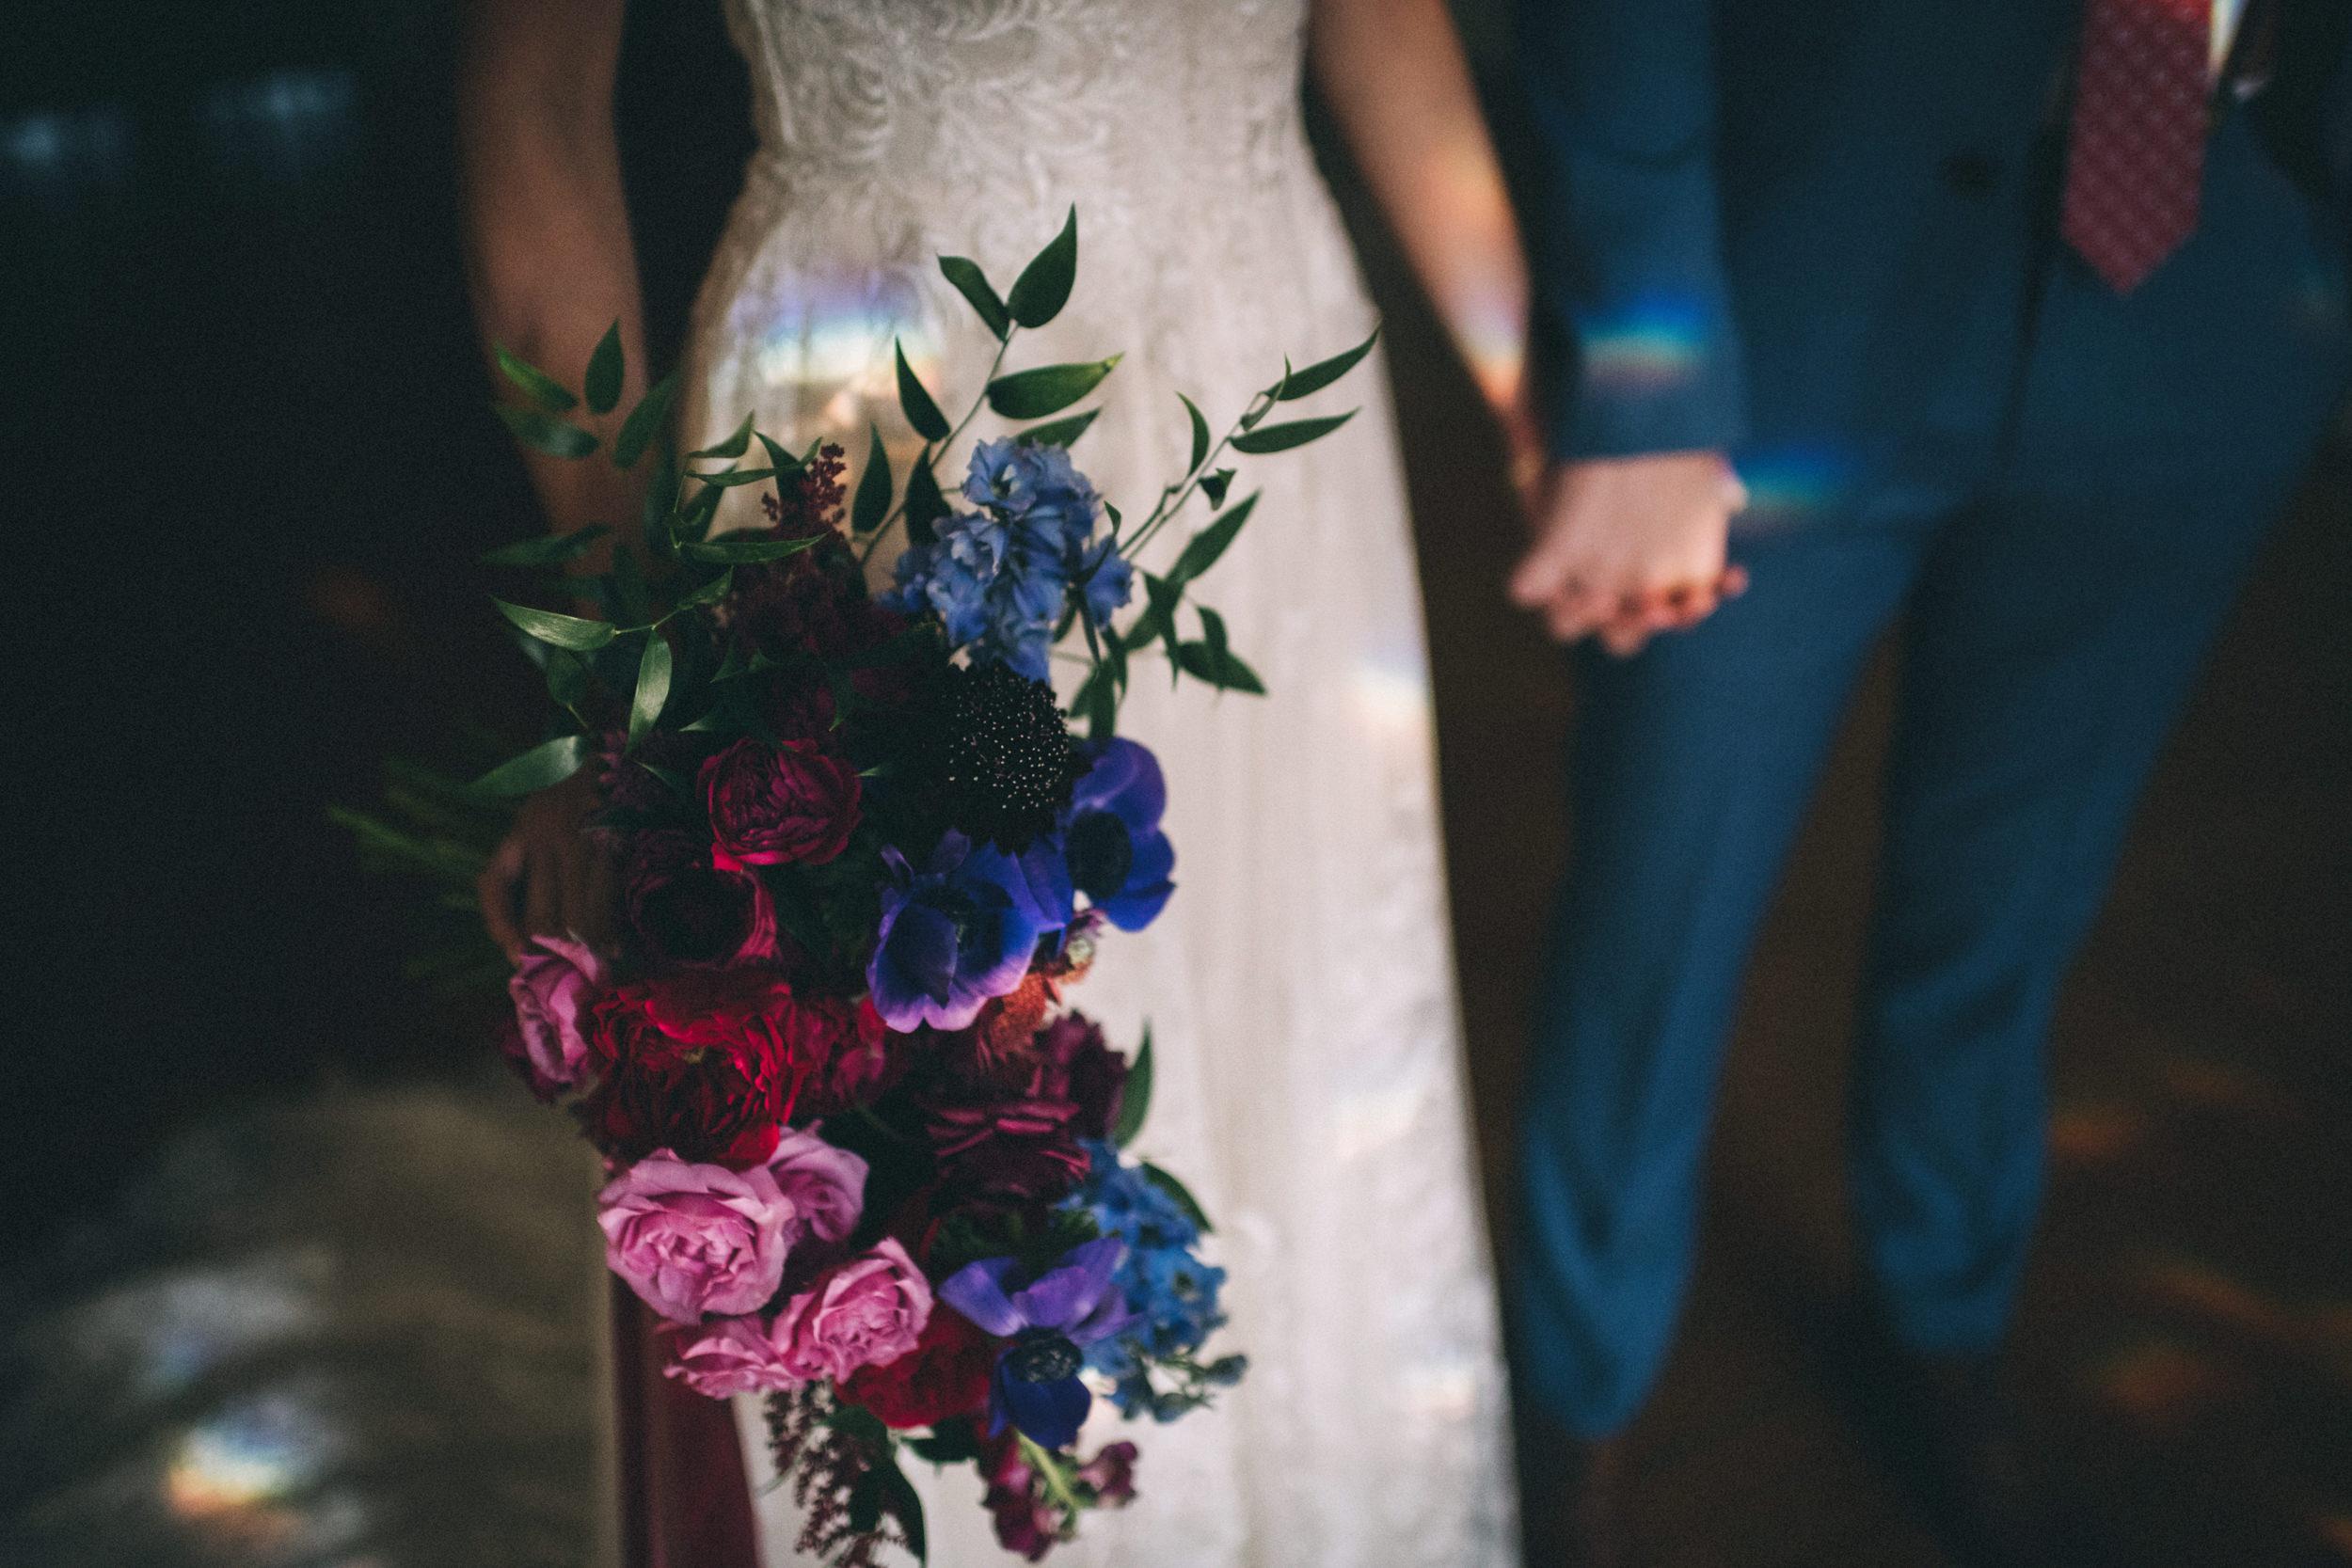 Louisville-Kentucky-Wedding-and-Elopement-Photographer-Sarah-Katherine-Davis-Photography-Summer-Jewel-Toned-Wedding-Chineese-Tea-Ceremony-Warrenwood-Manor-Danville-416.jpg